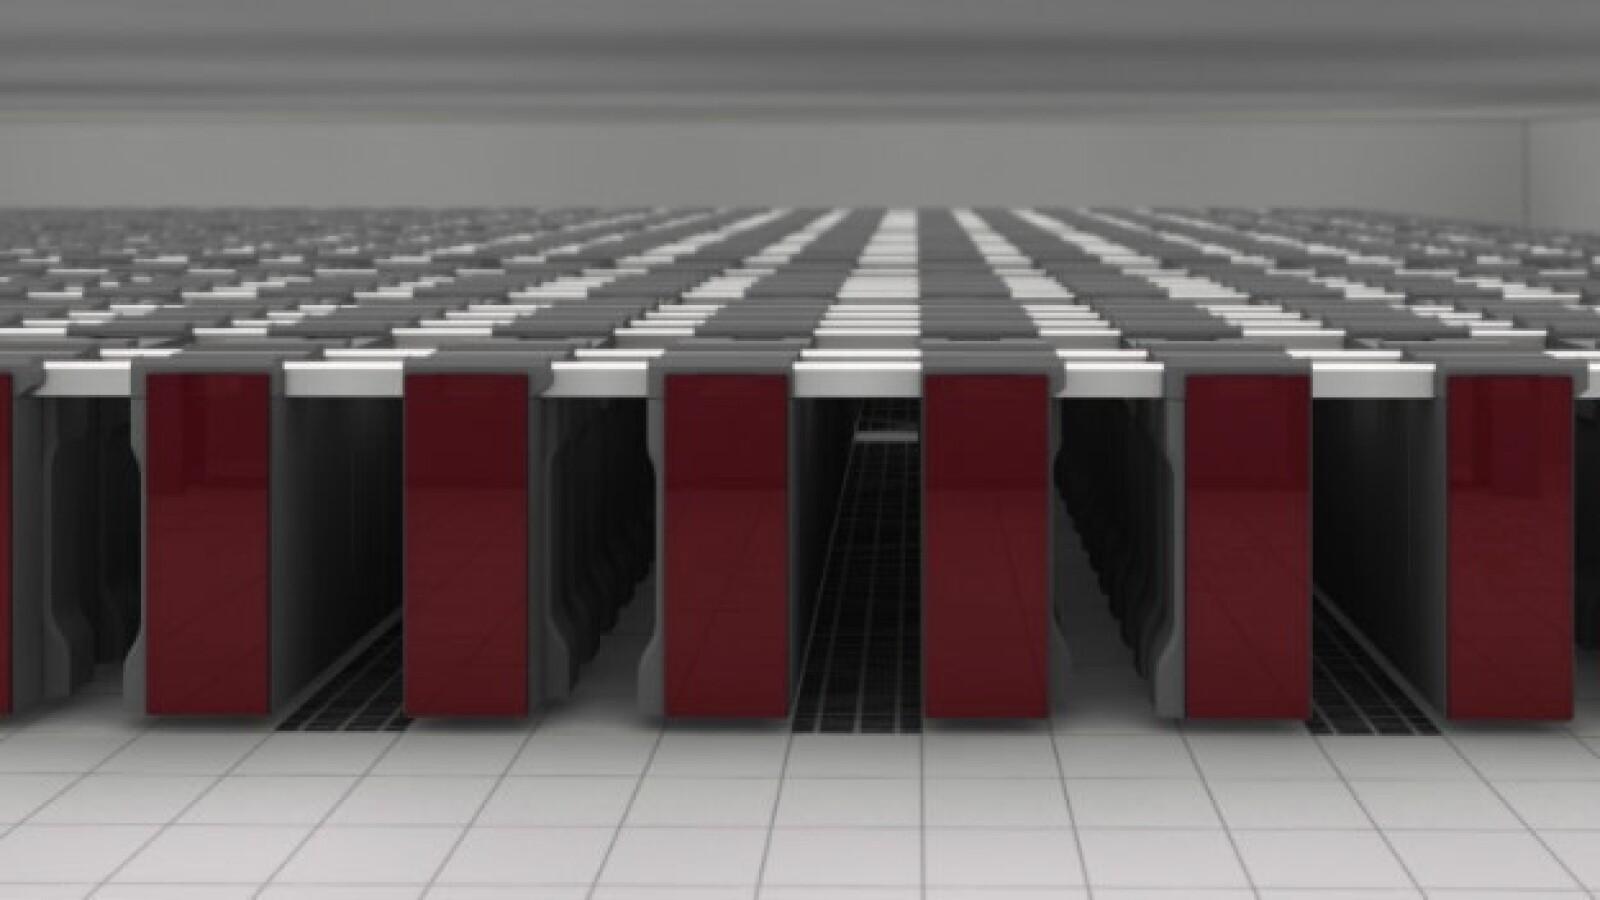 supercomputadora computadora